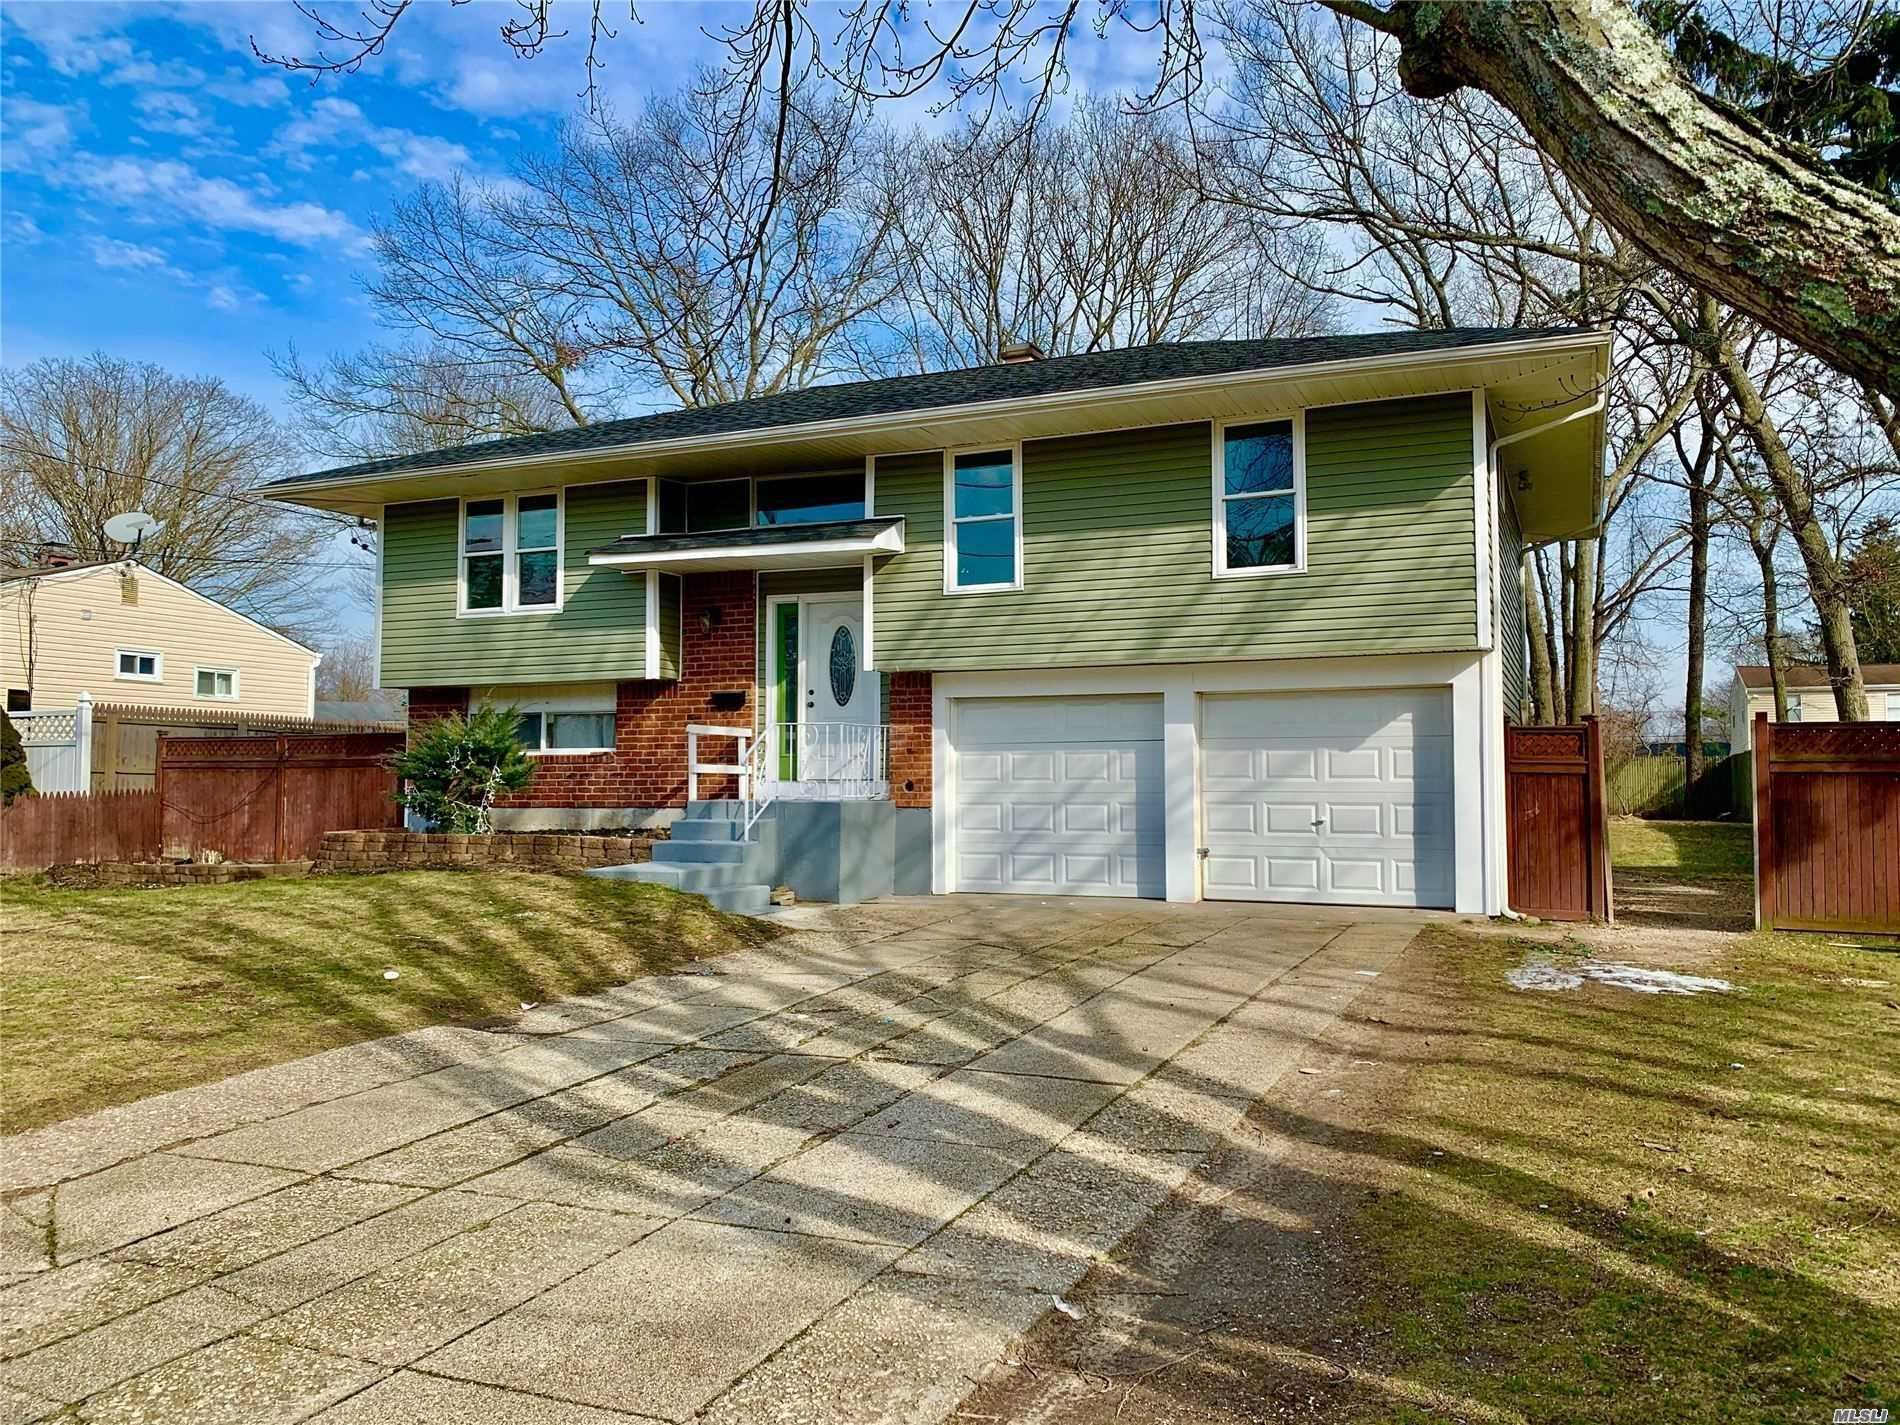 43 Lloyd Drive, Brentwood, NY 11717 - MLS#: 3207882